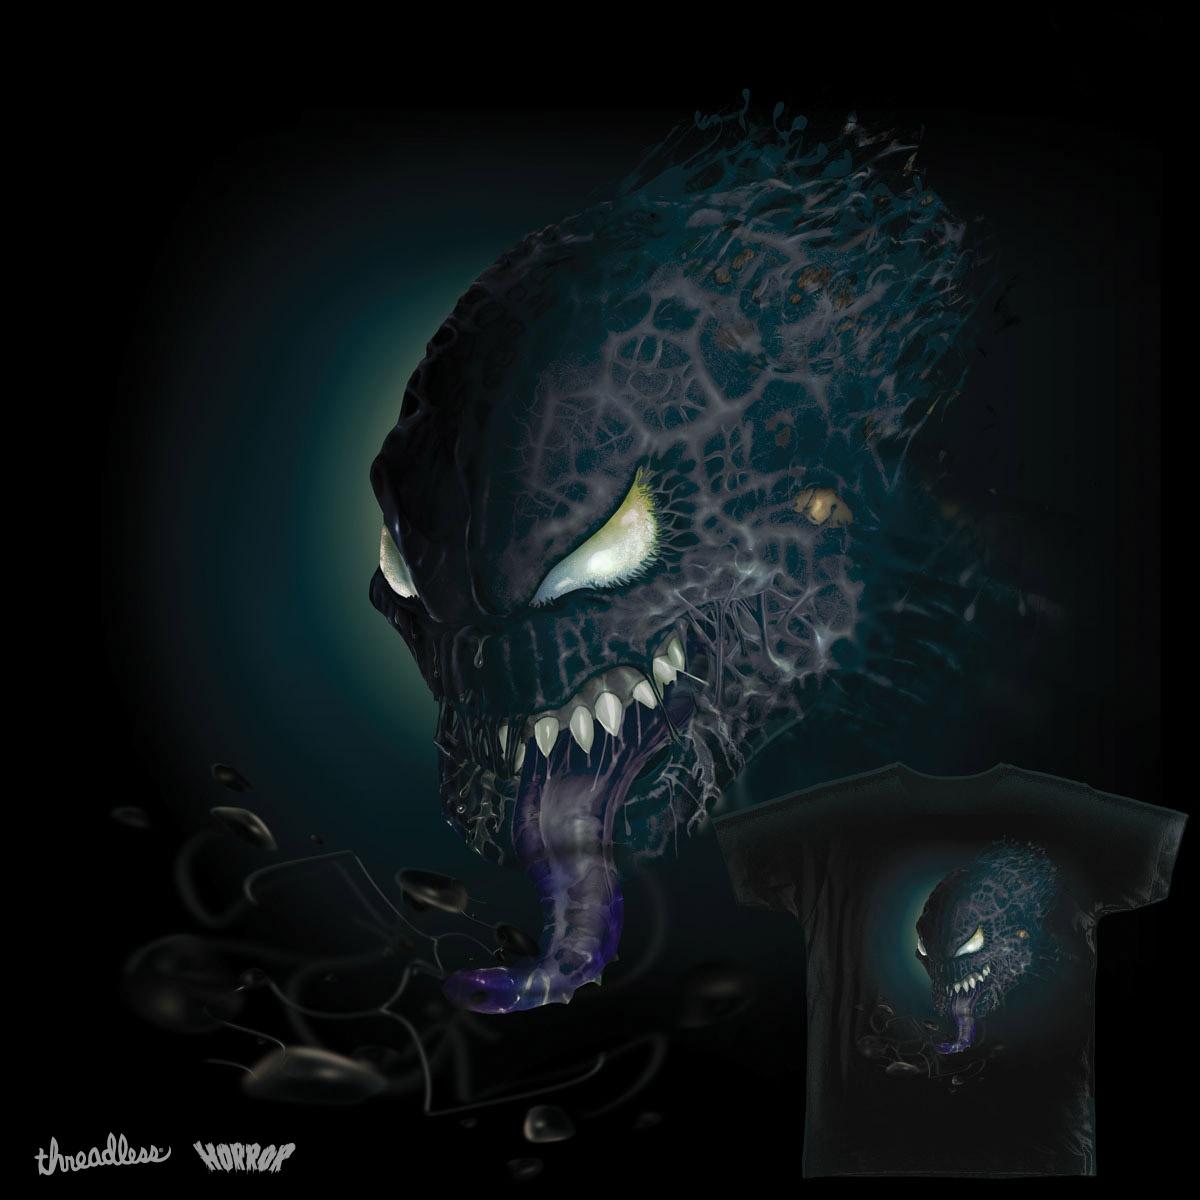 Dark Venom by chyldish on Threadless